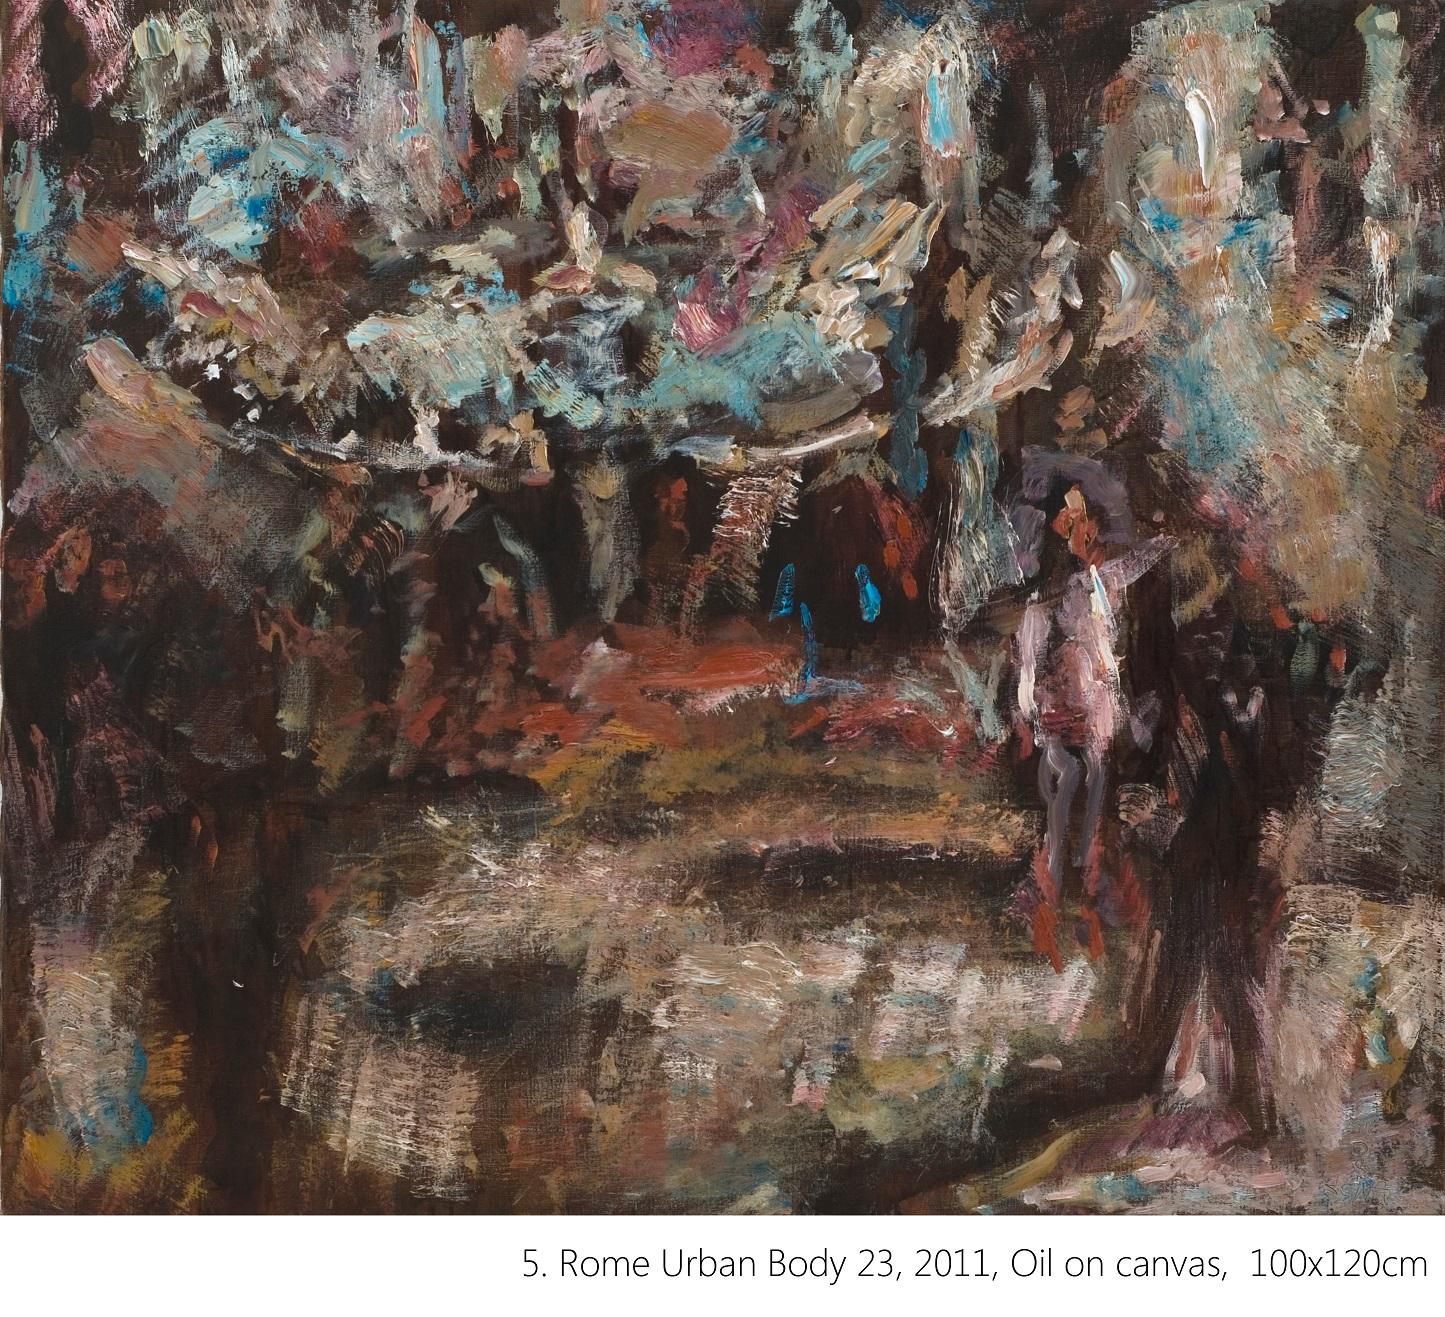 5. Rome Urban Body 23, 2011, Oil on canvas, 100x120cm